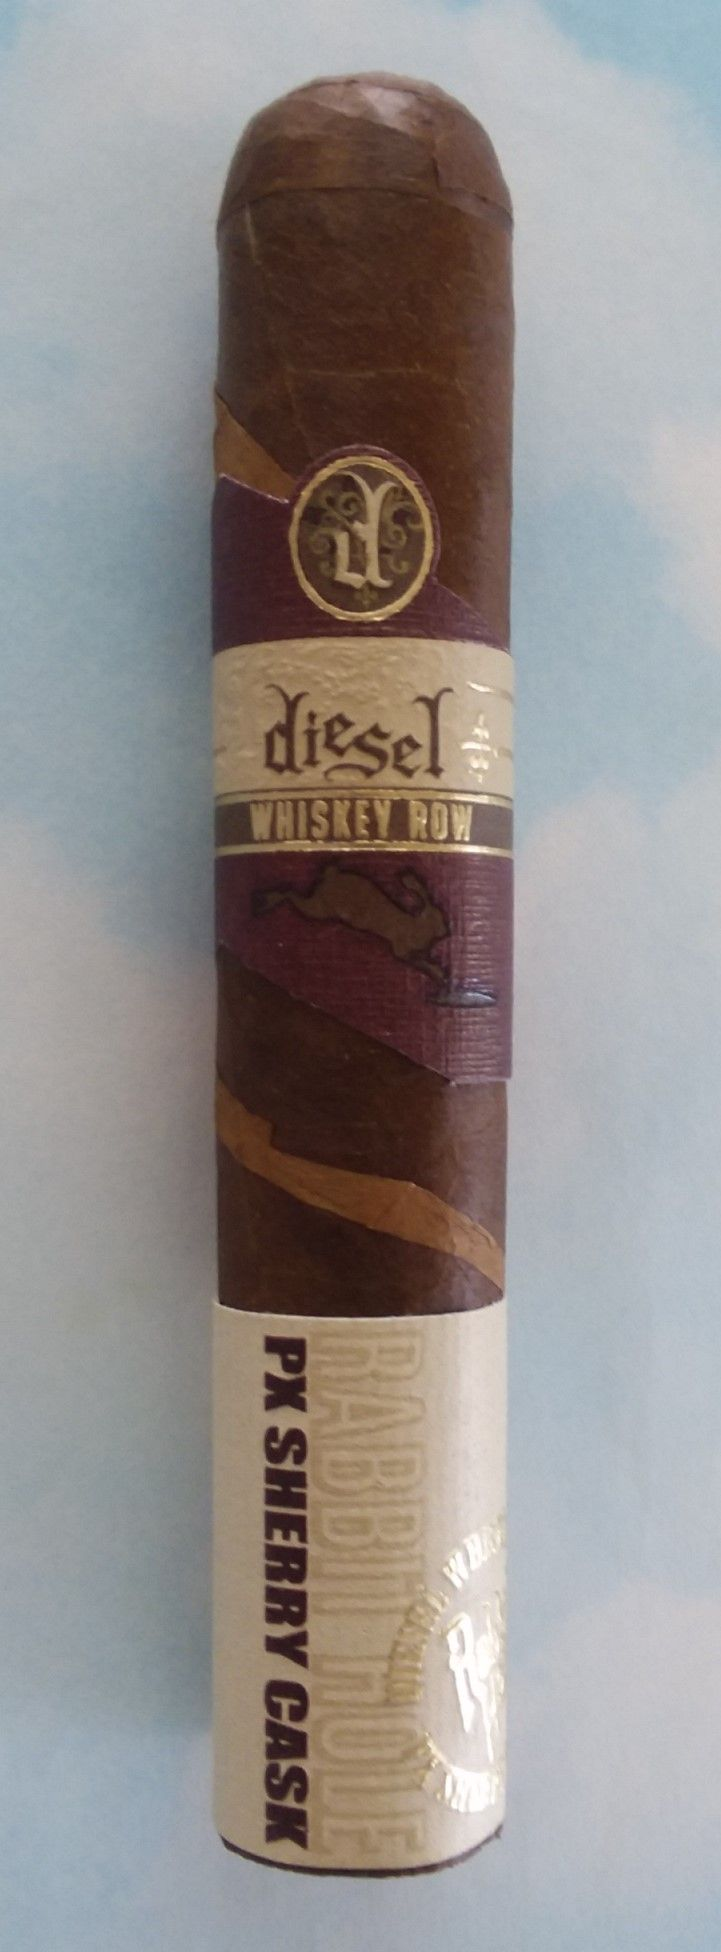 Diesel Sherry Cask Holiday 2020 Cigar